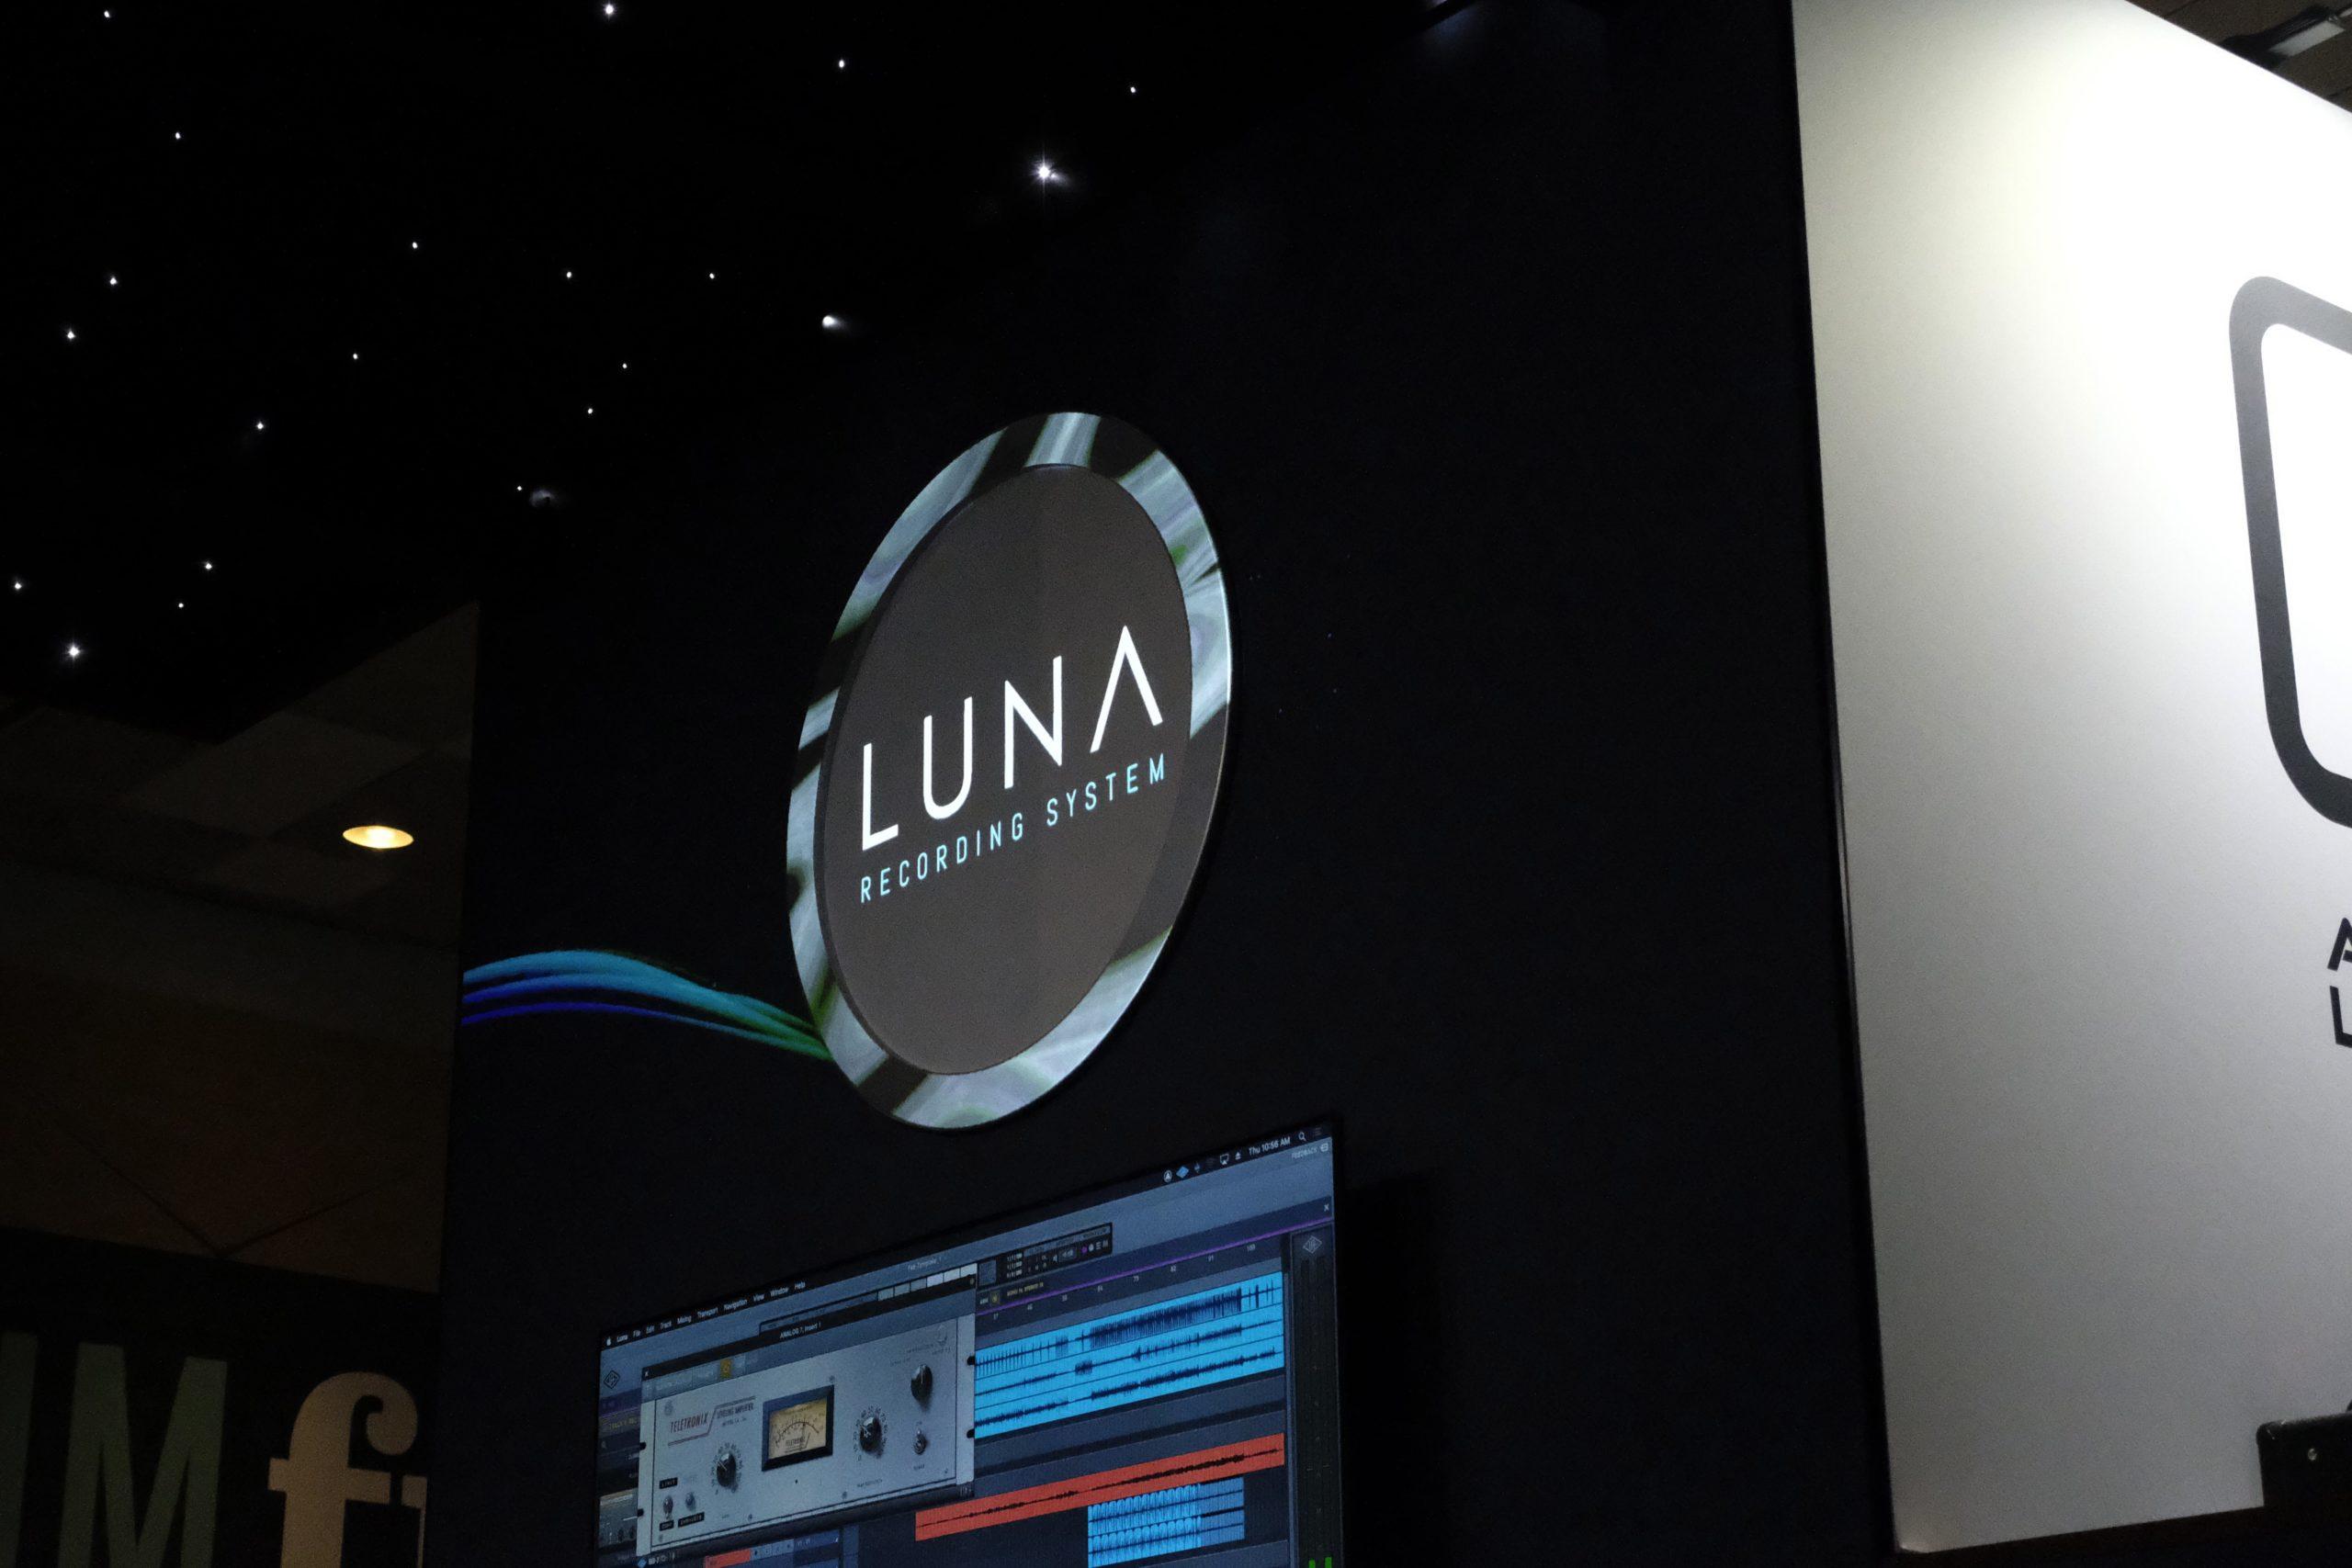 Universal Audio LUNA recording system logo